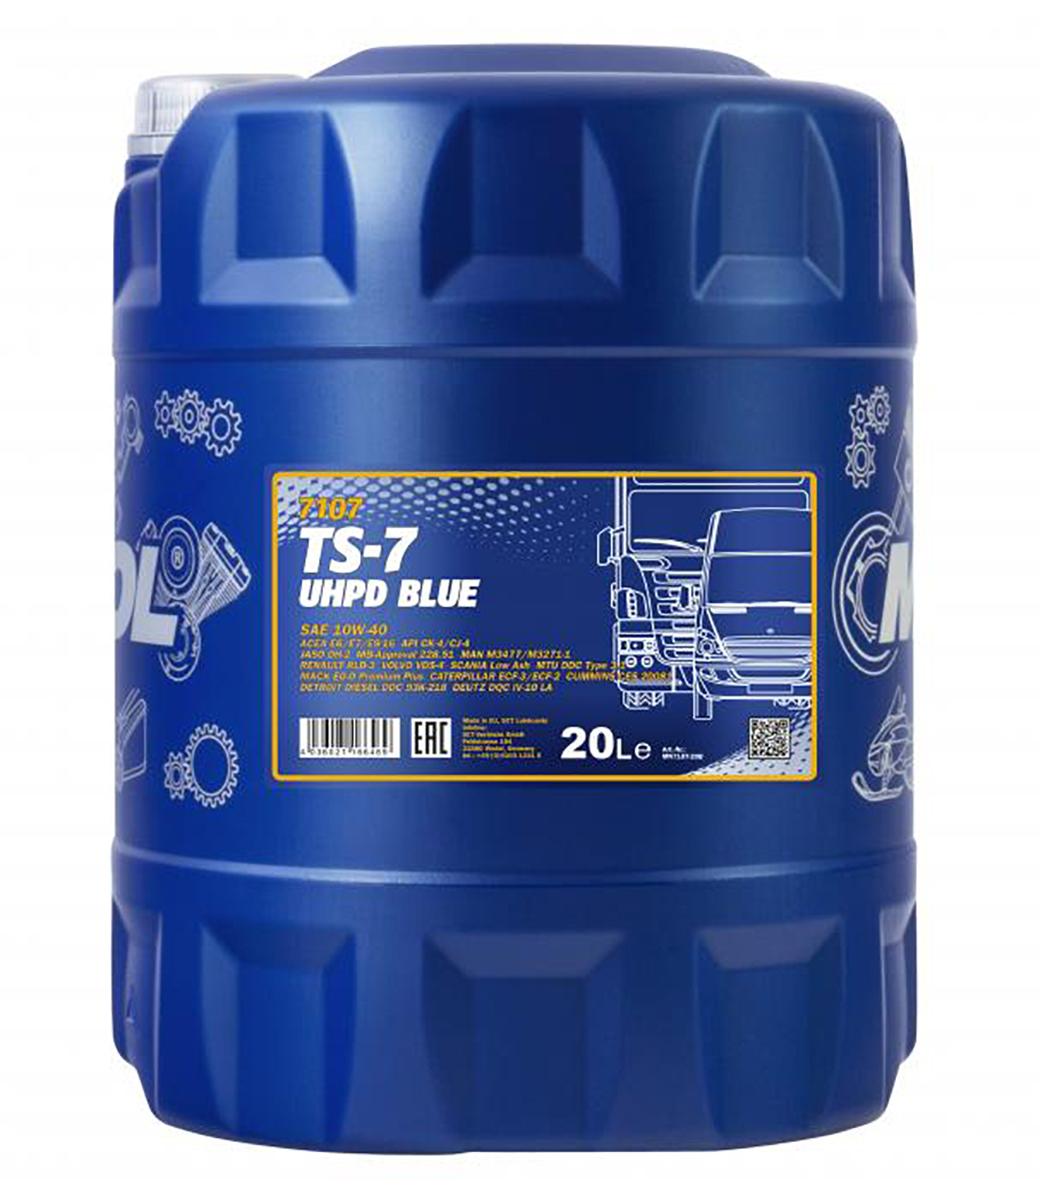 TS-7 UHPD Blue 10W-40